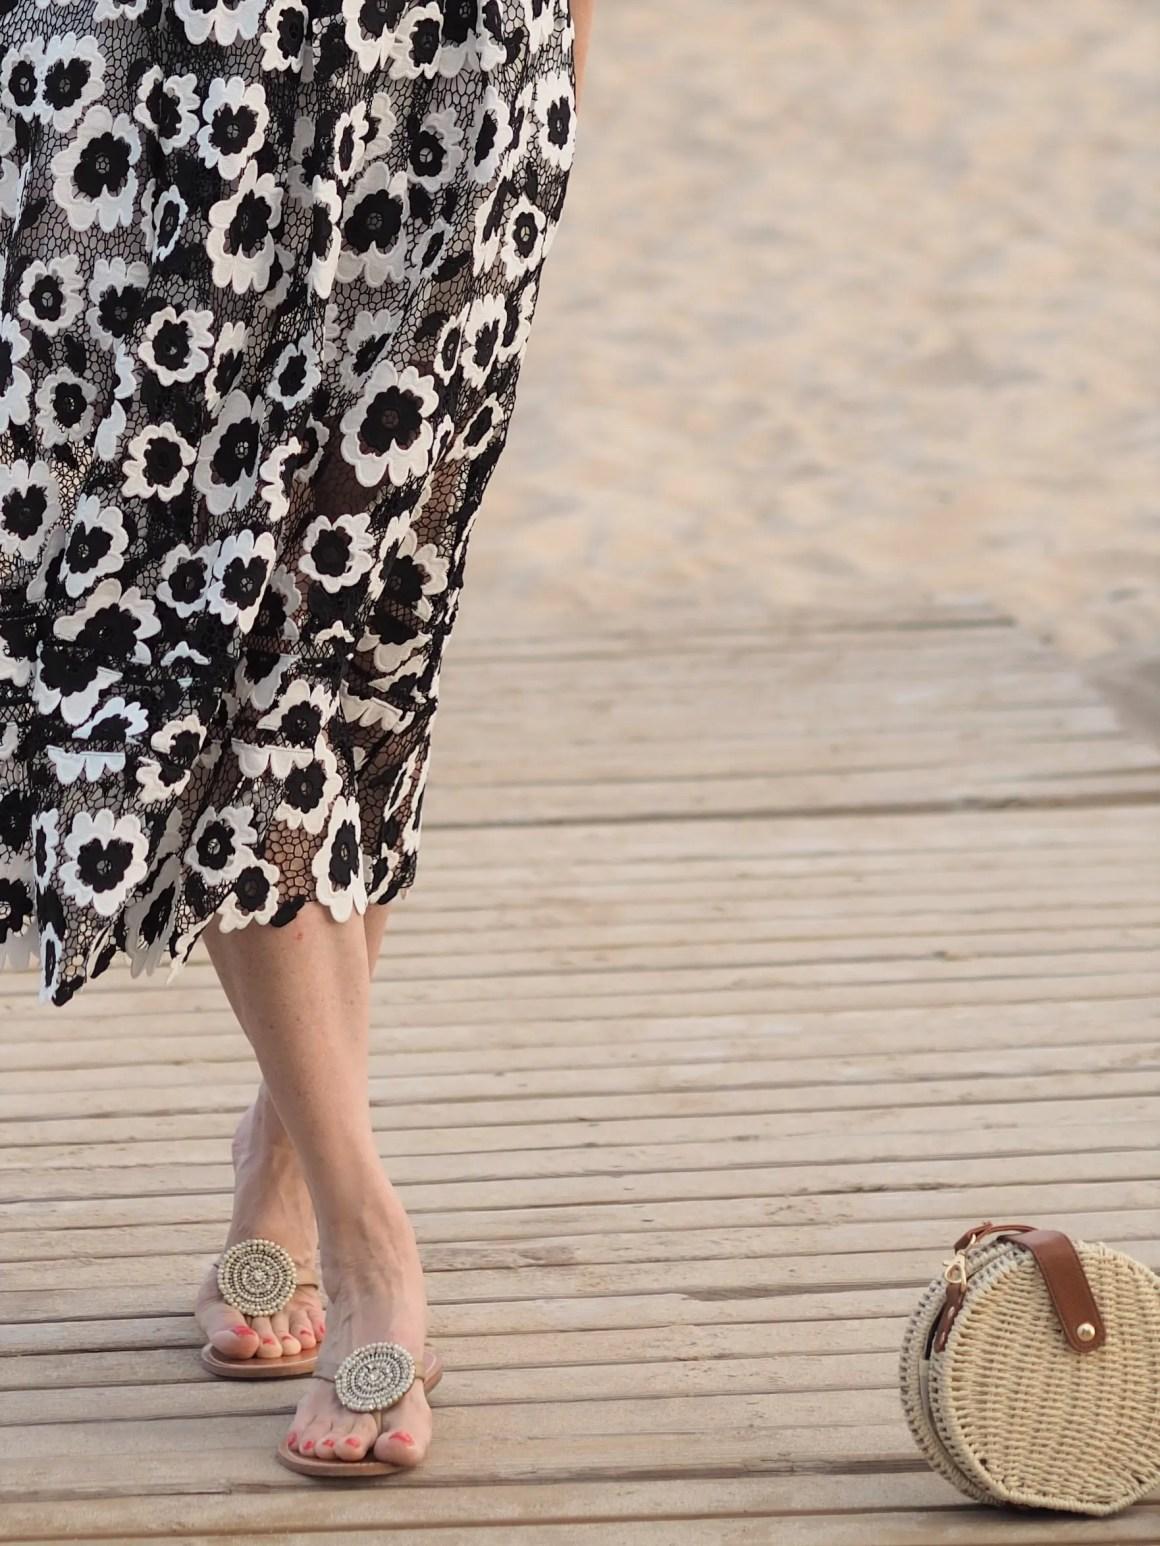 Self-Portrait Black and White Dress: informal Styling